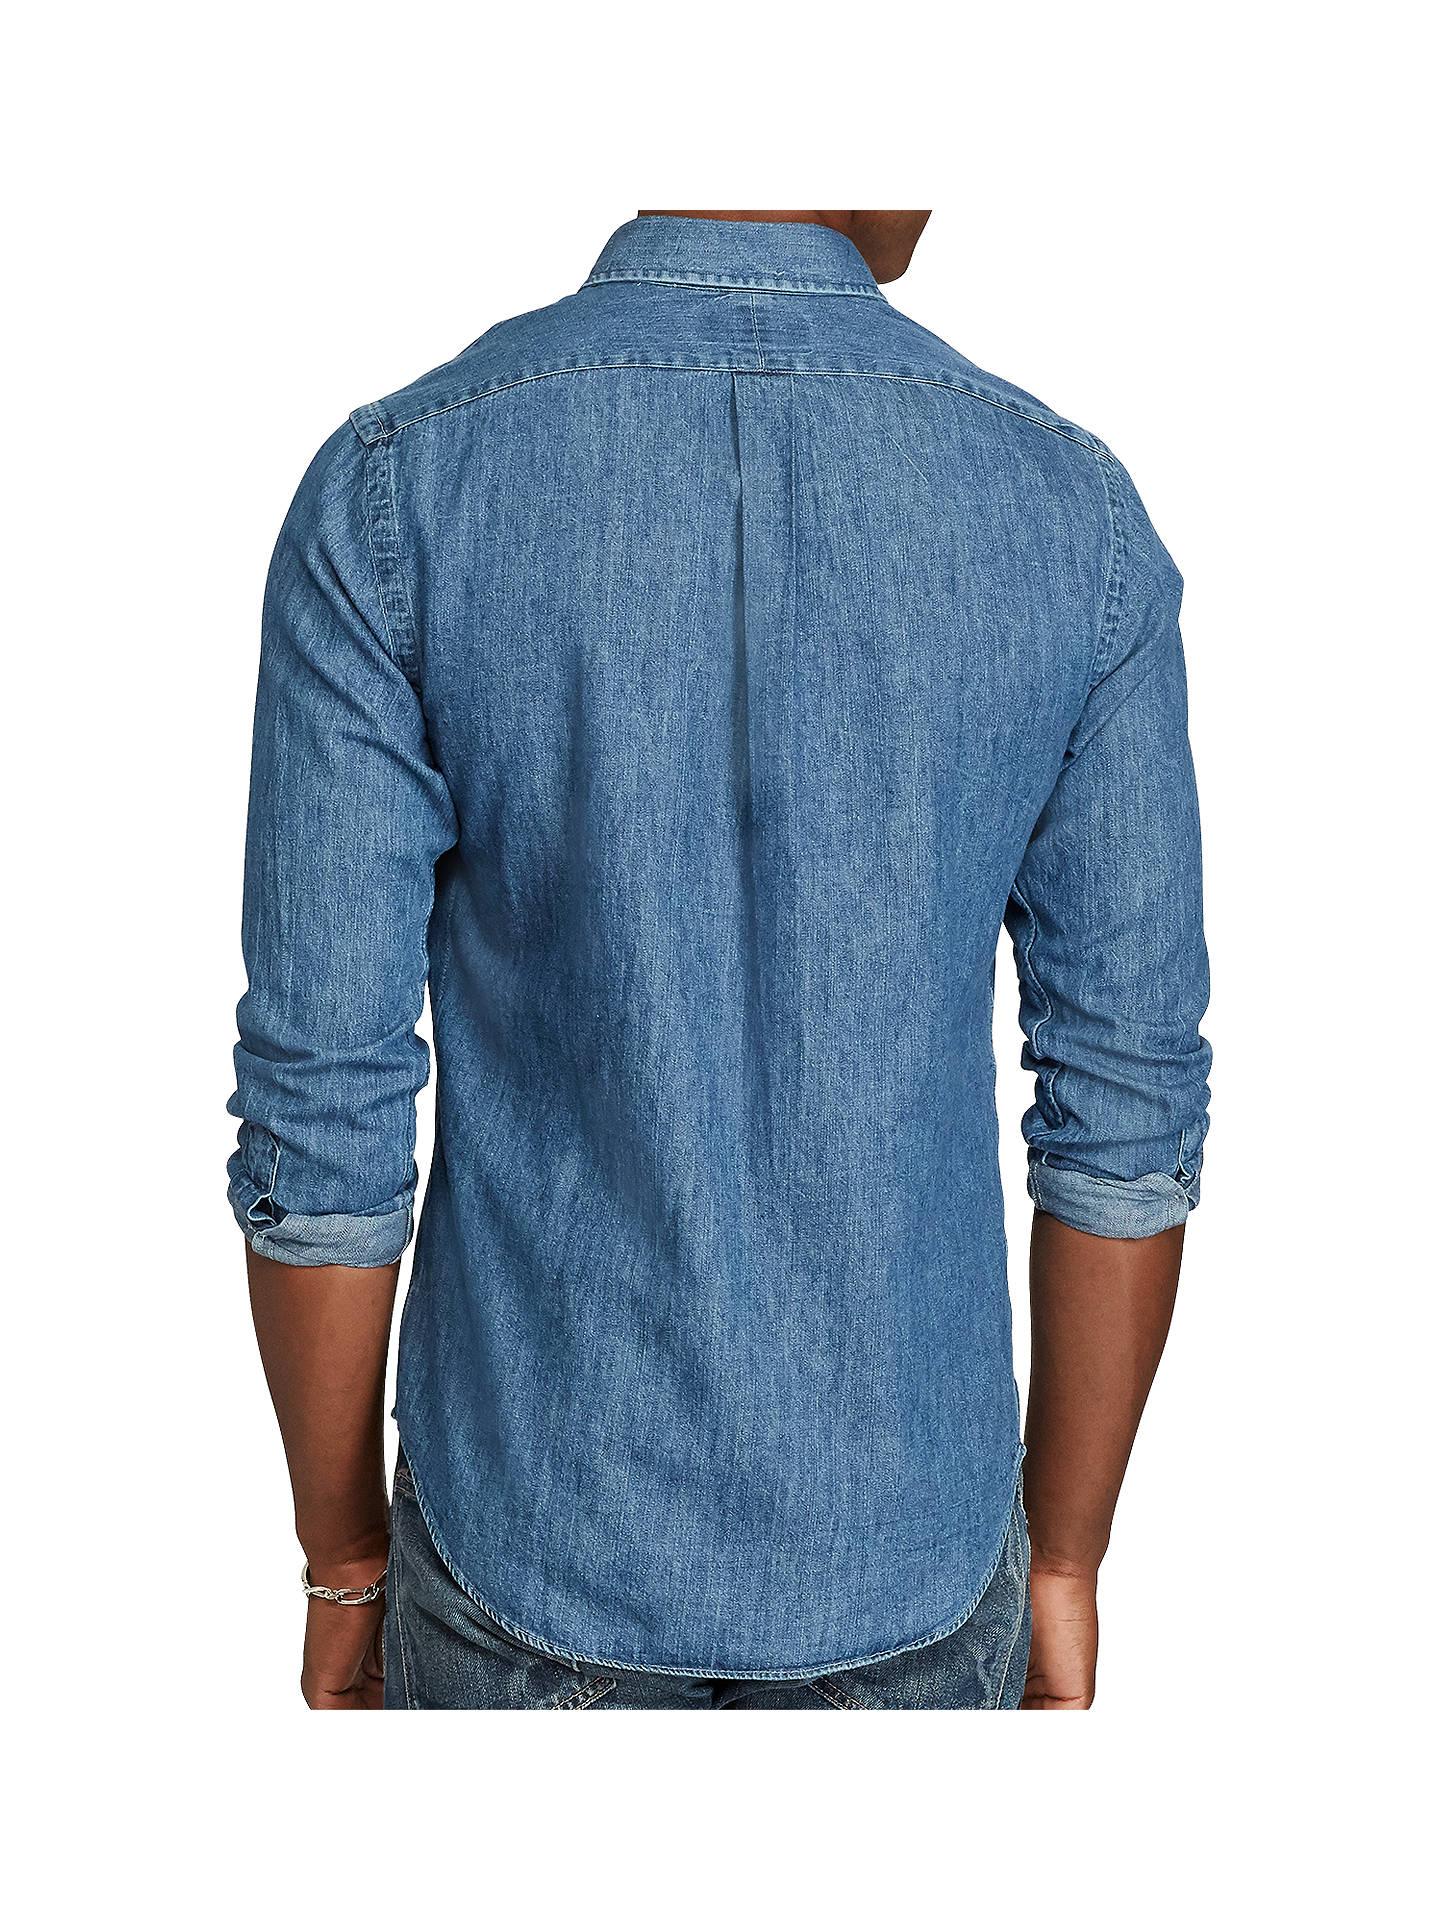 d08234ca3f4 ... Buy Polo Ralph Lauren Long Sleeve Slim Fit Denim Shirt